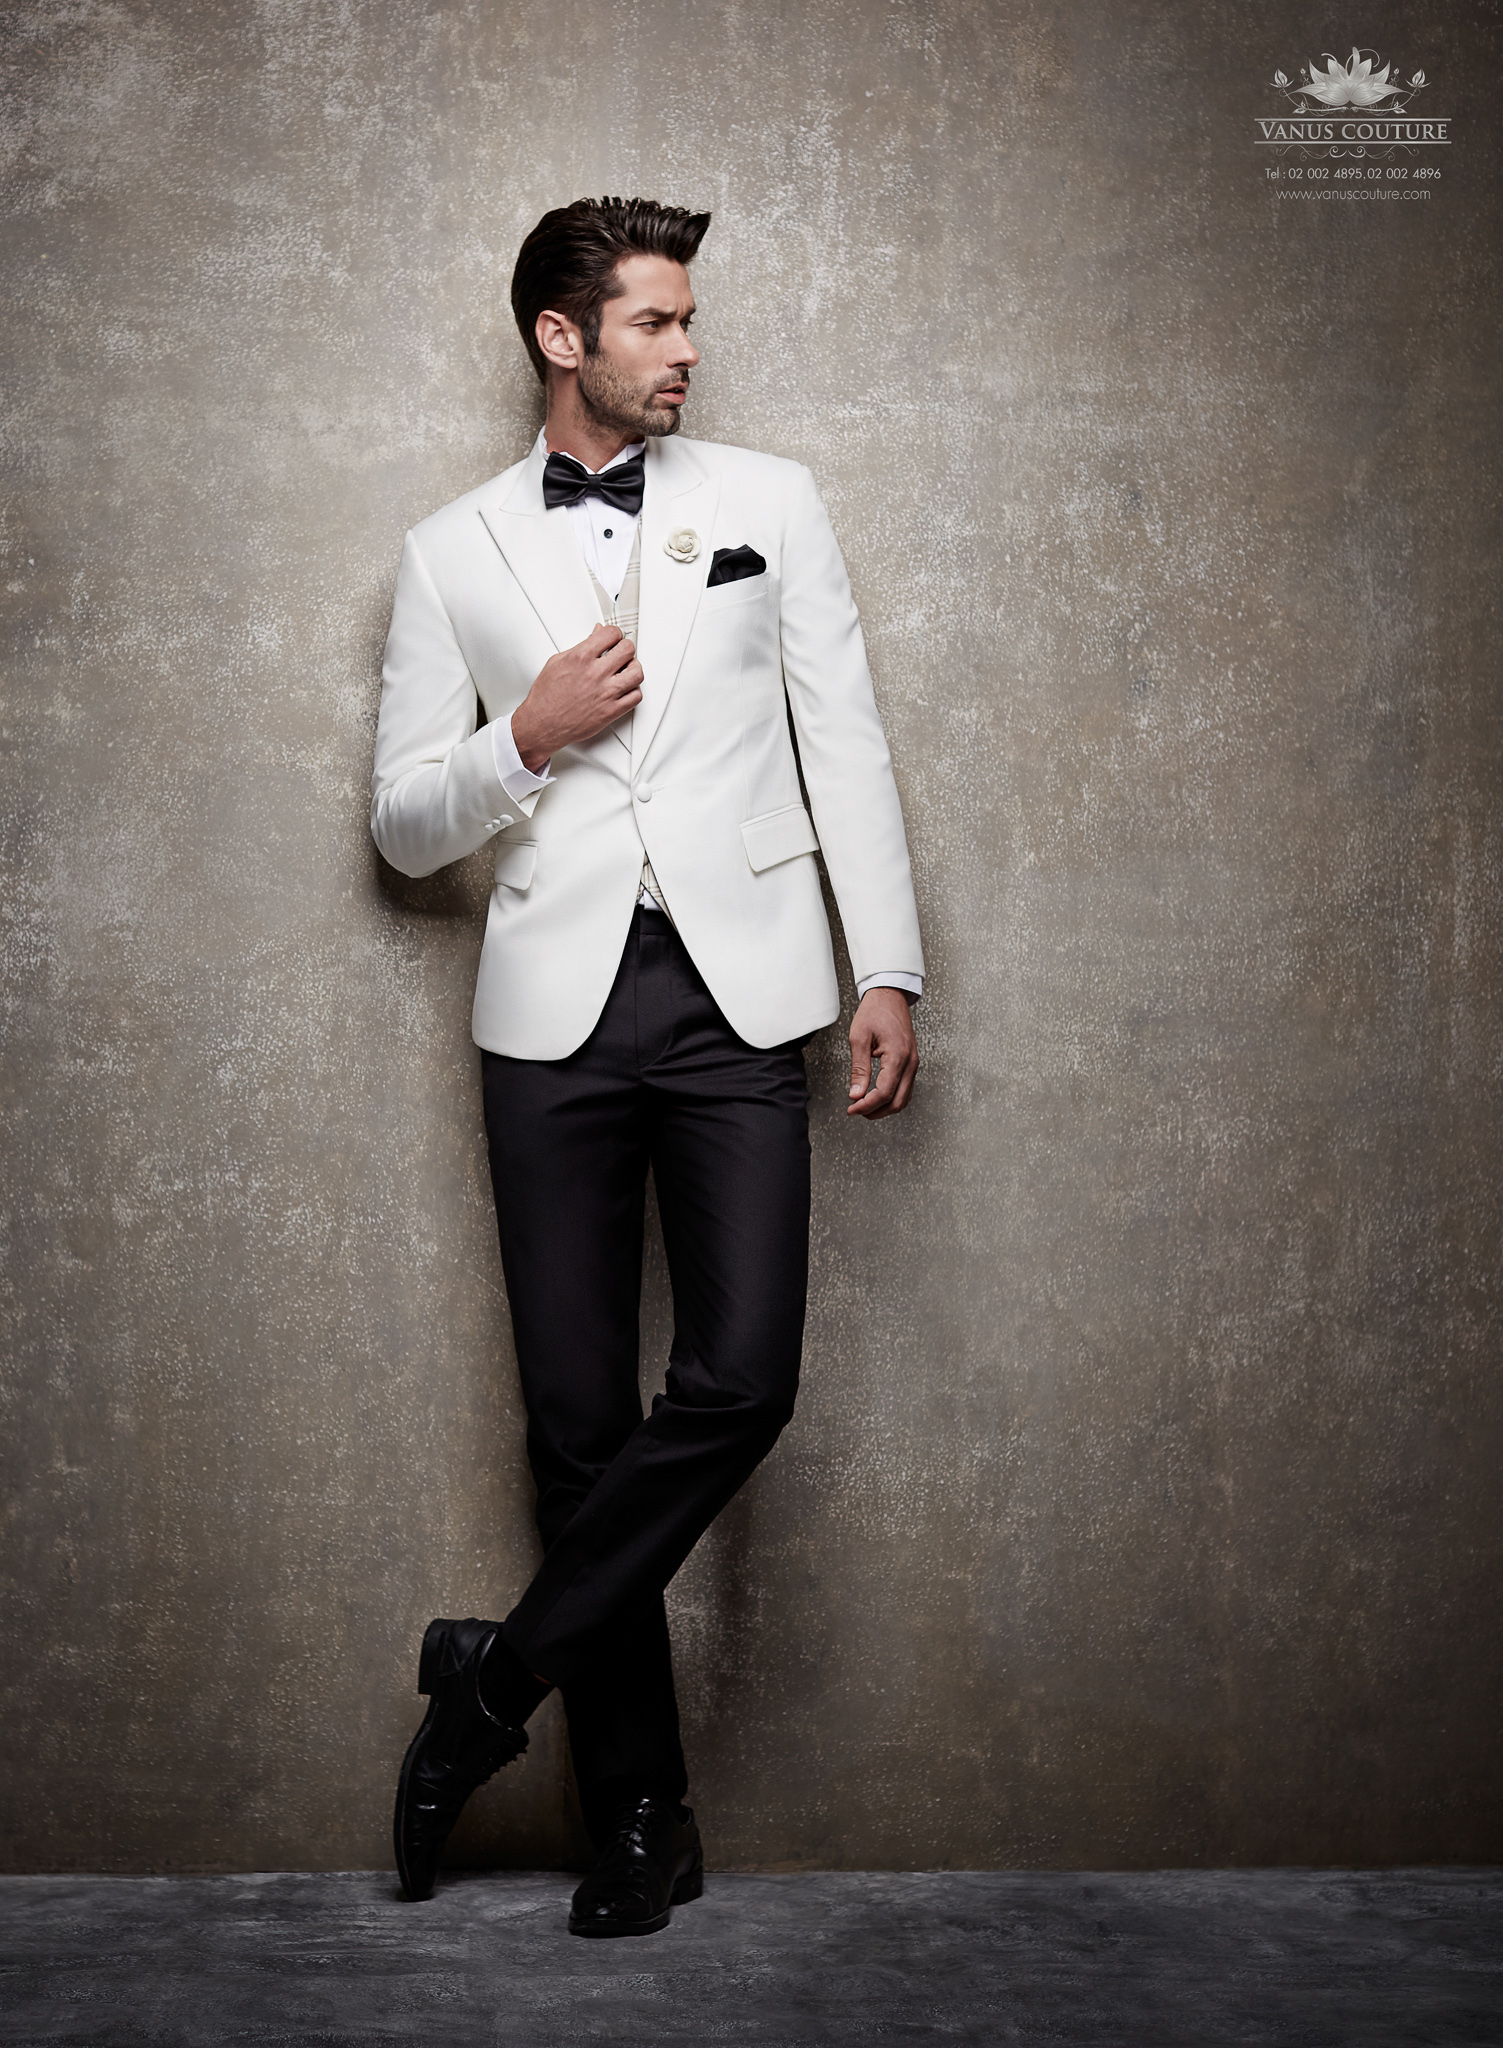 Groom suit - Justin 07